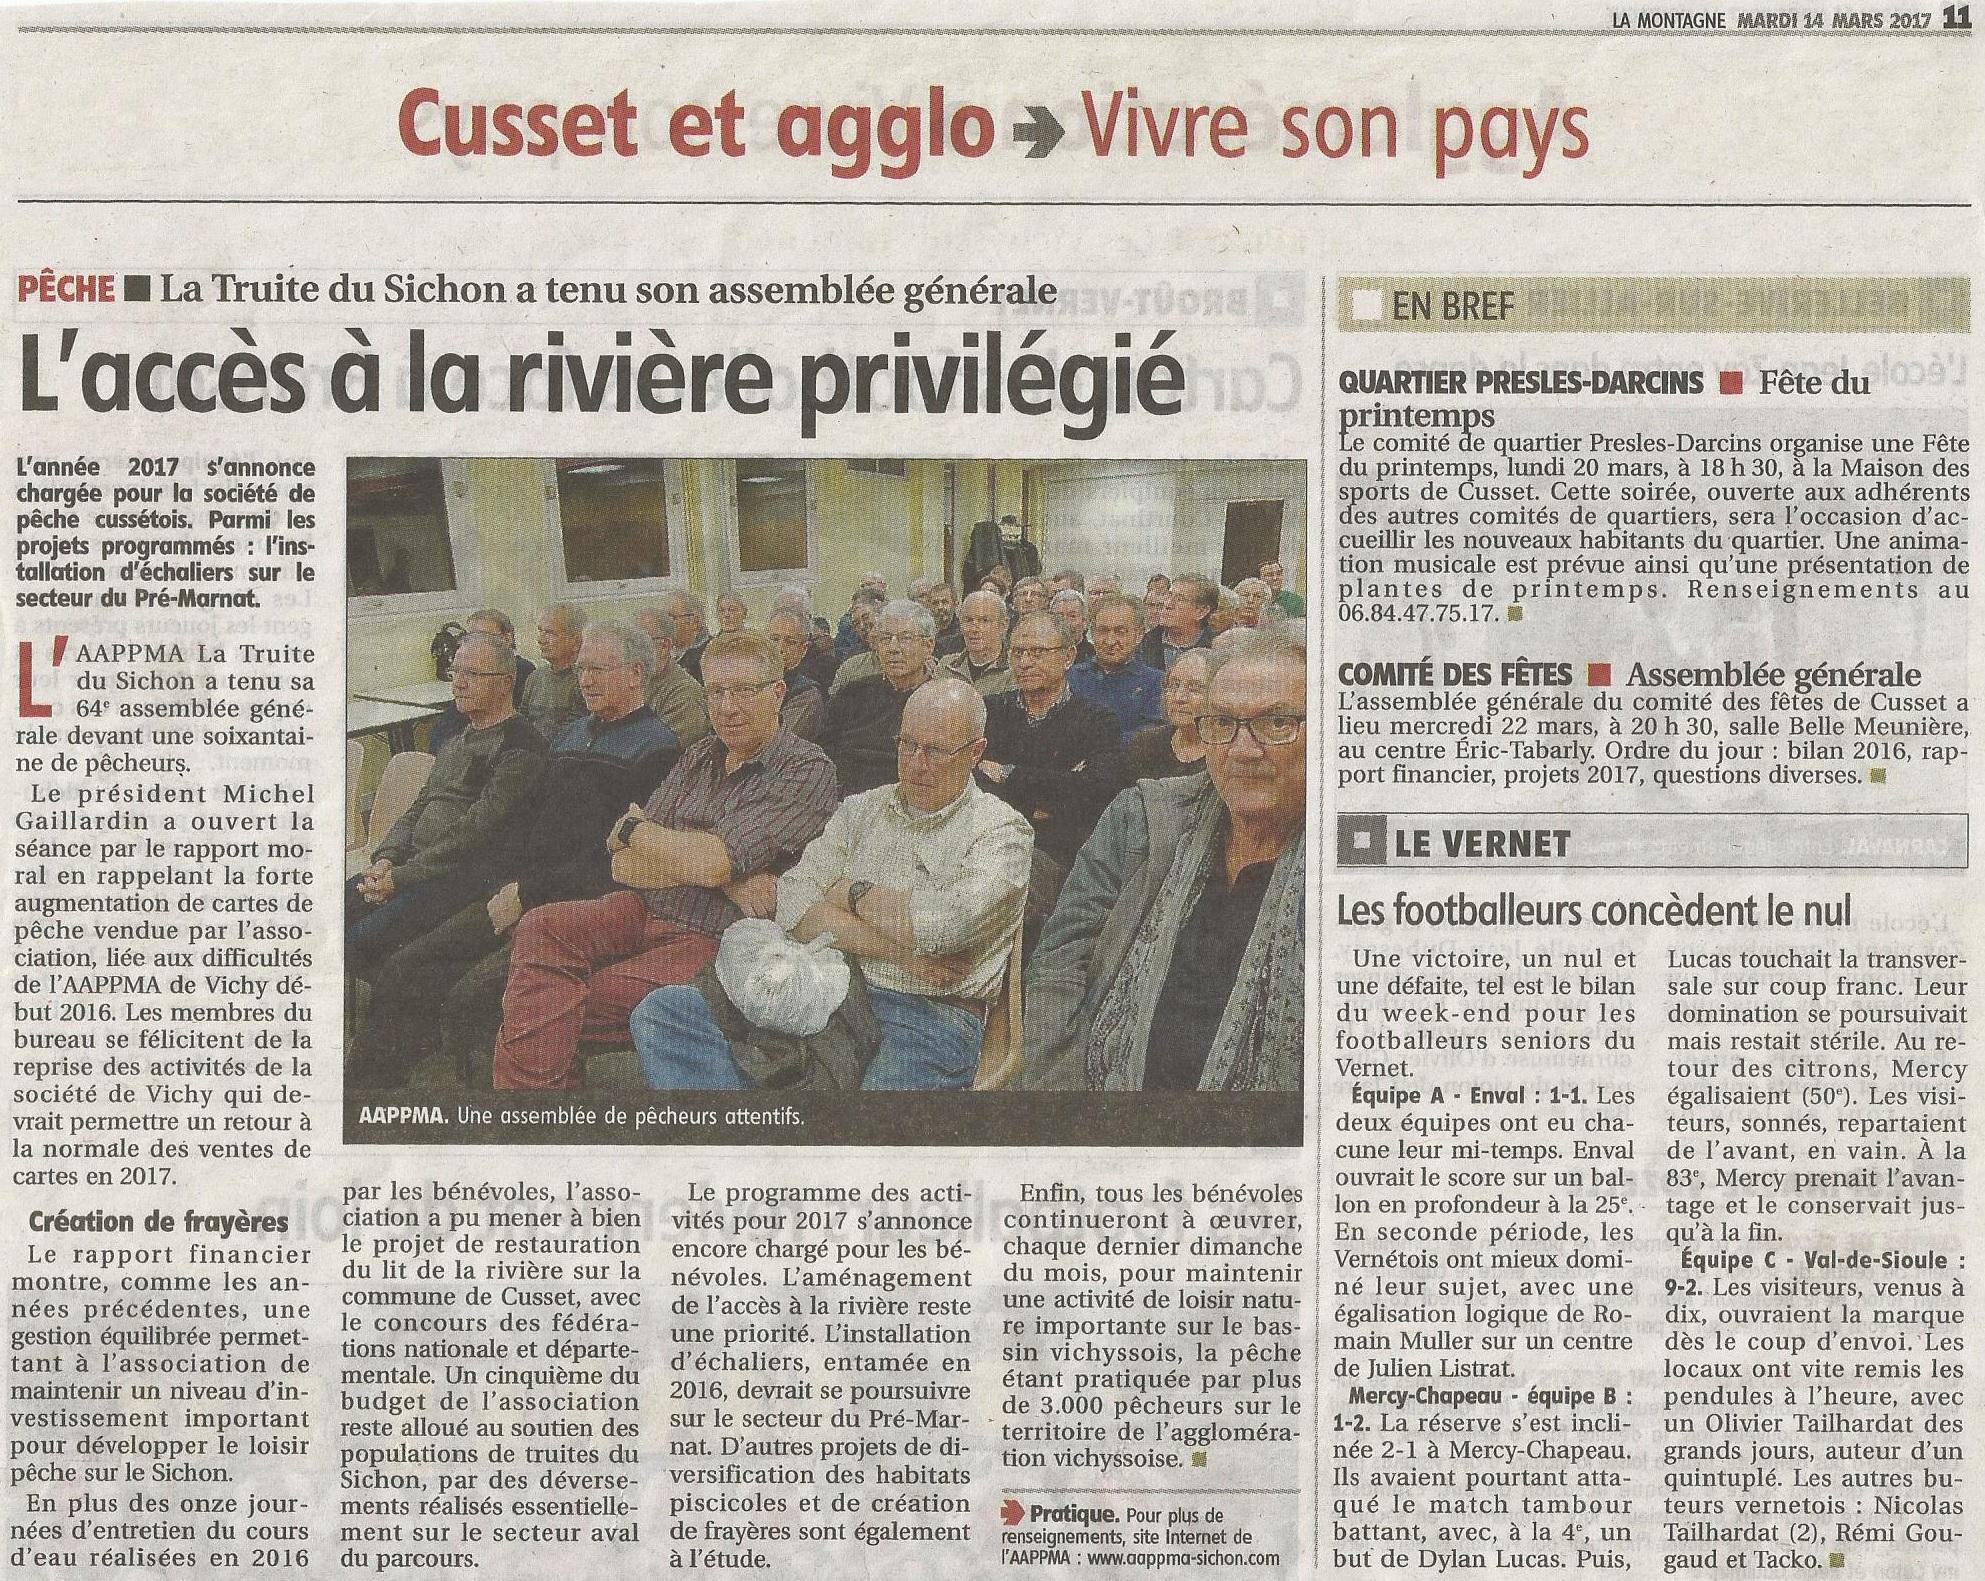 Info presse : AG AAPPMA Truite du Sichon